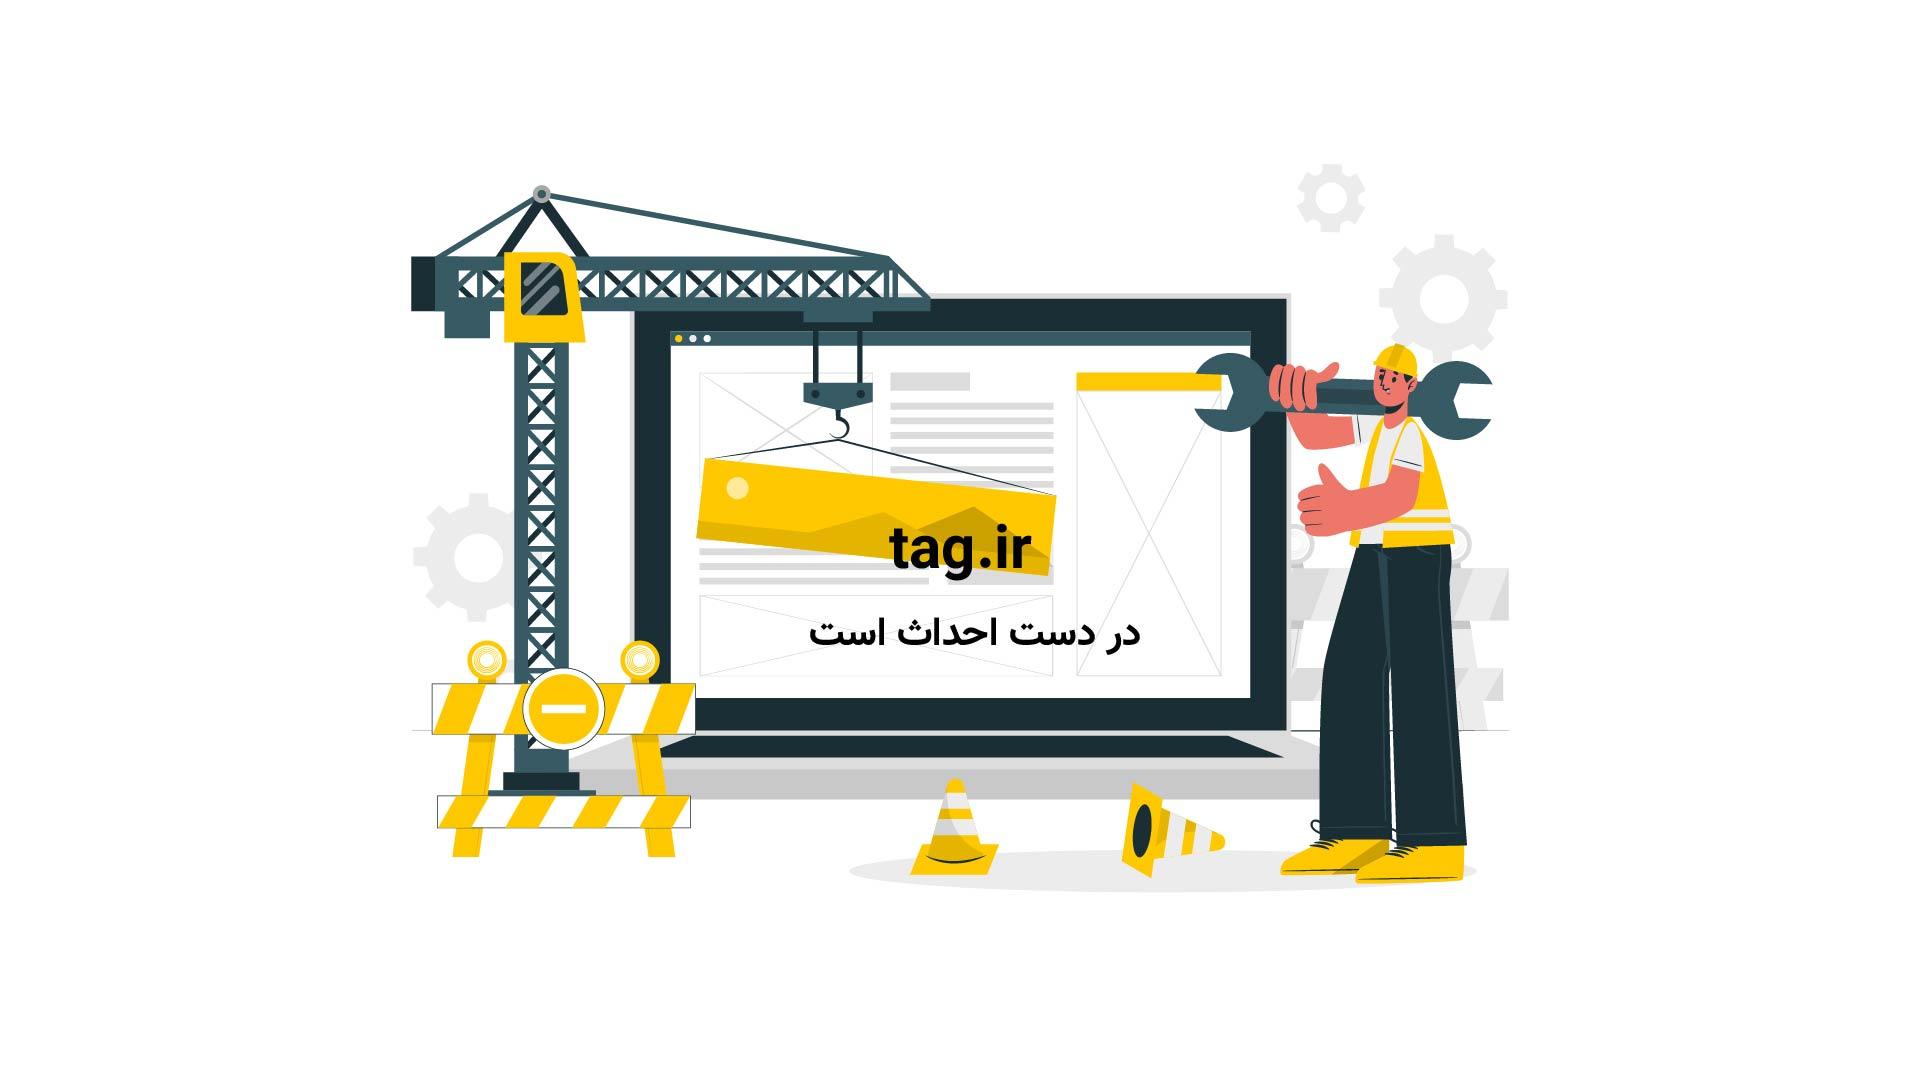 آتش سوزی کالیفرنیا | تگ